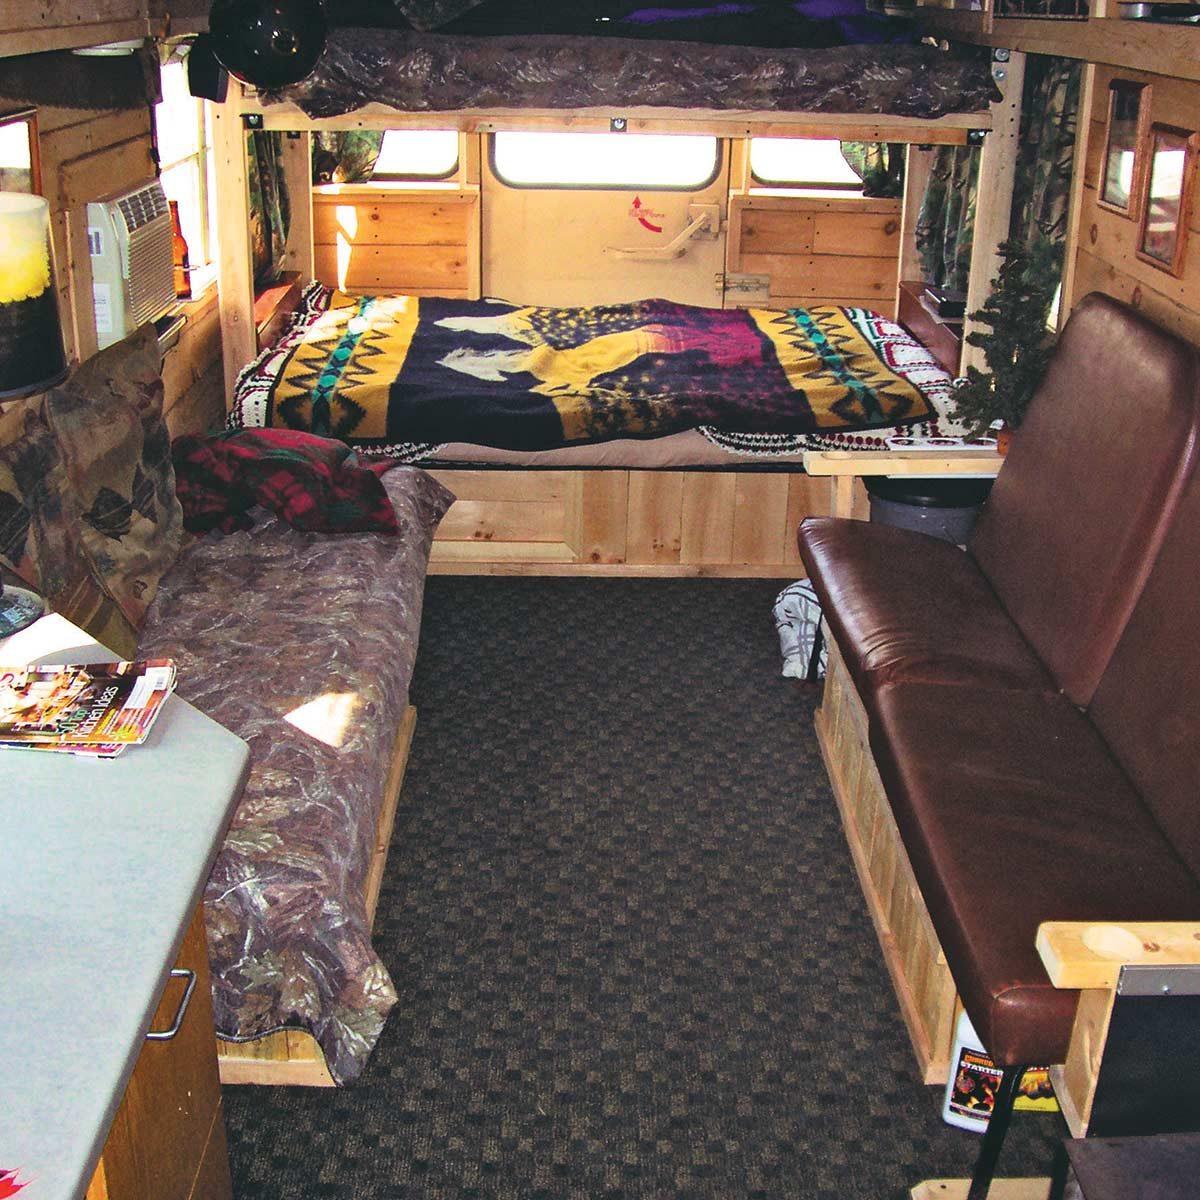 Inside of school bus turned into cabin